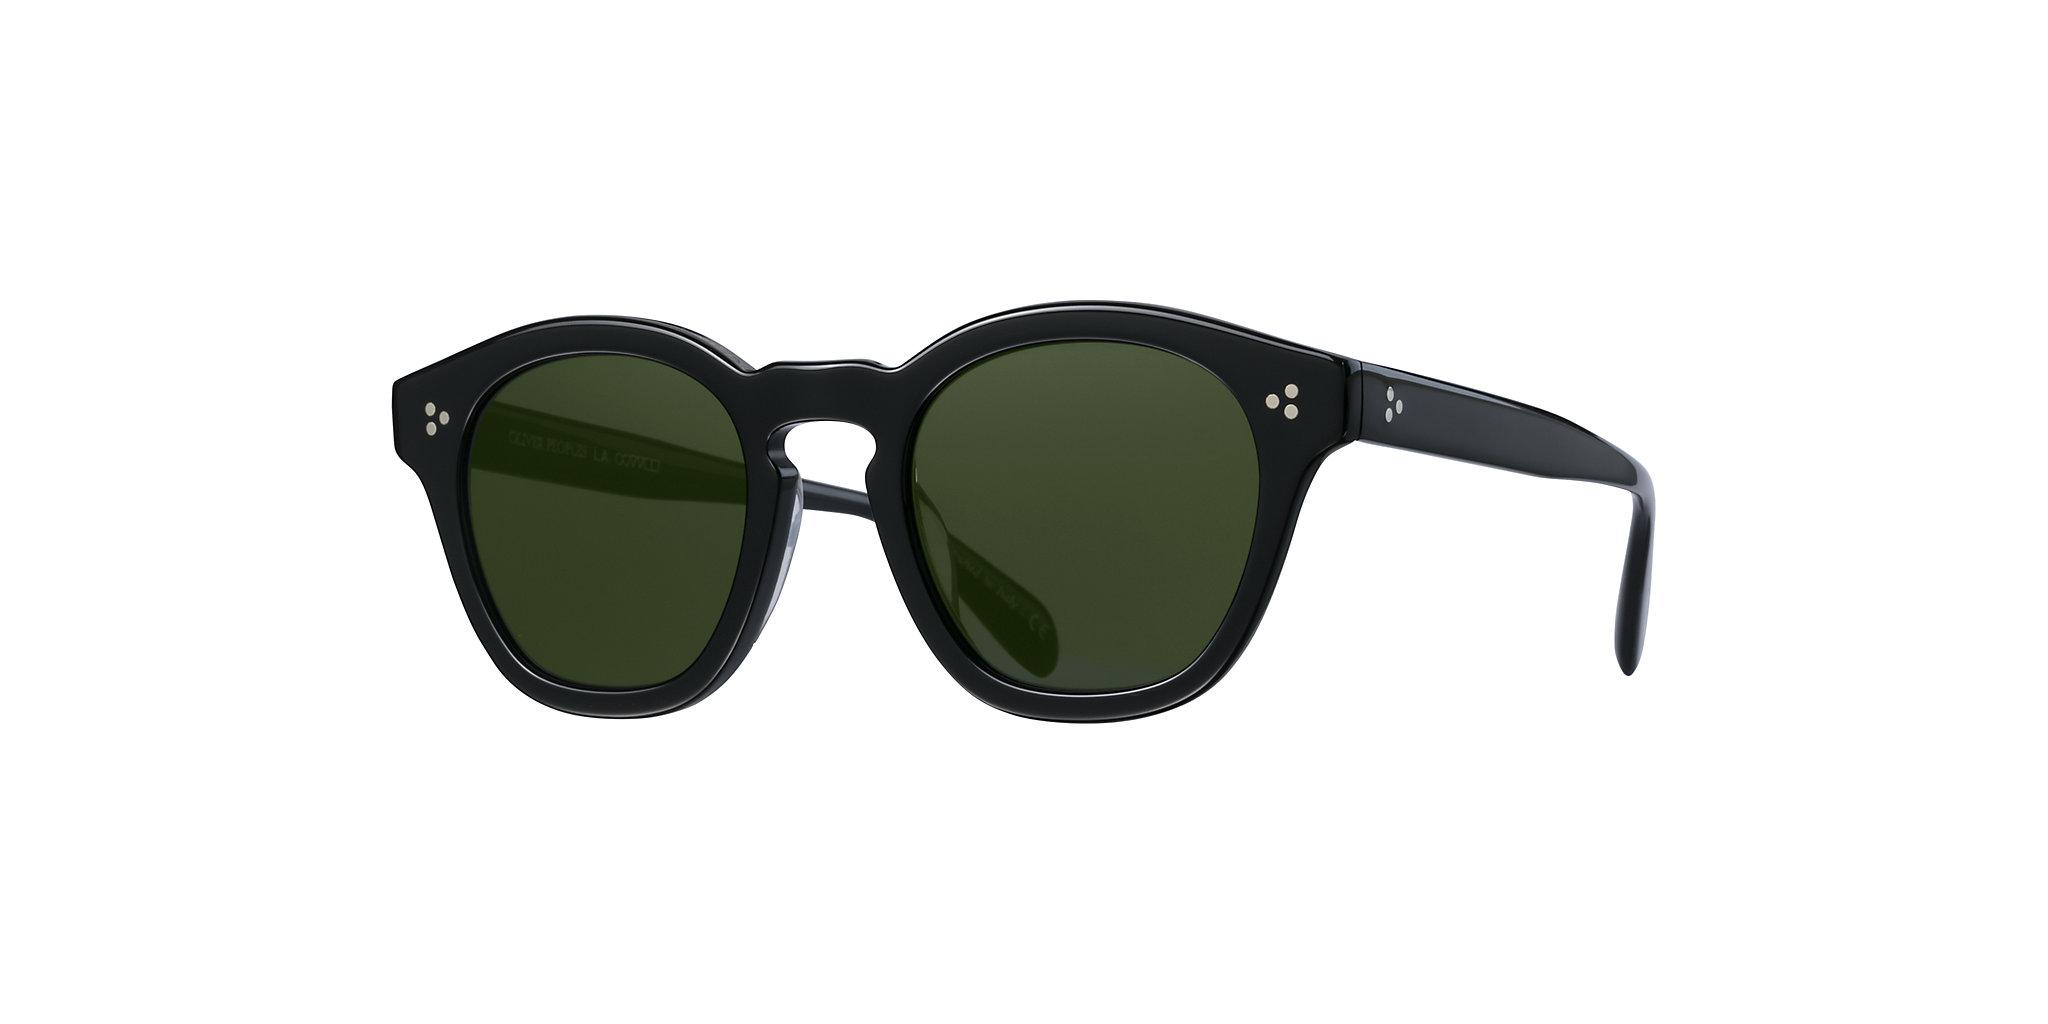 c95f25c36af Sun OV5382SU - Black - Green - Acetate